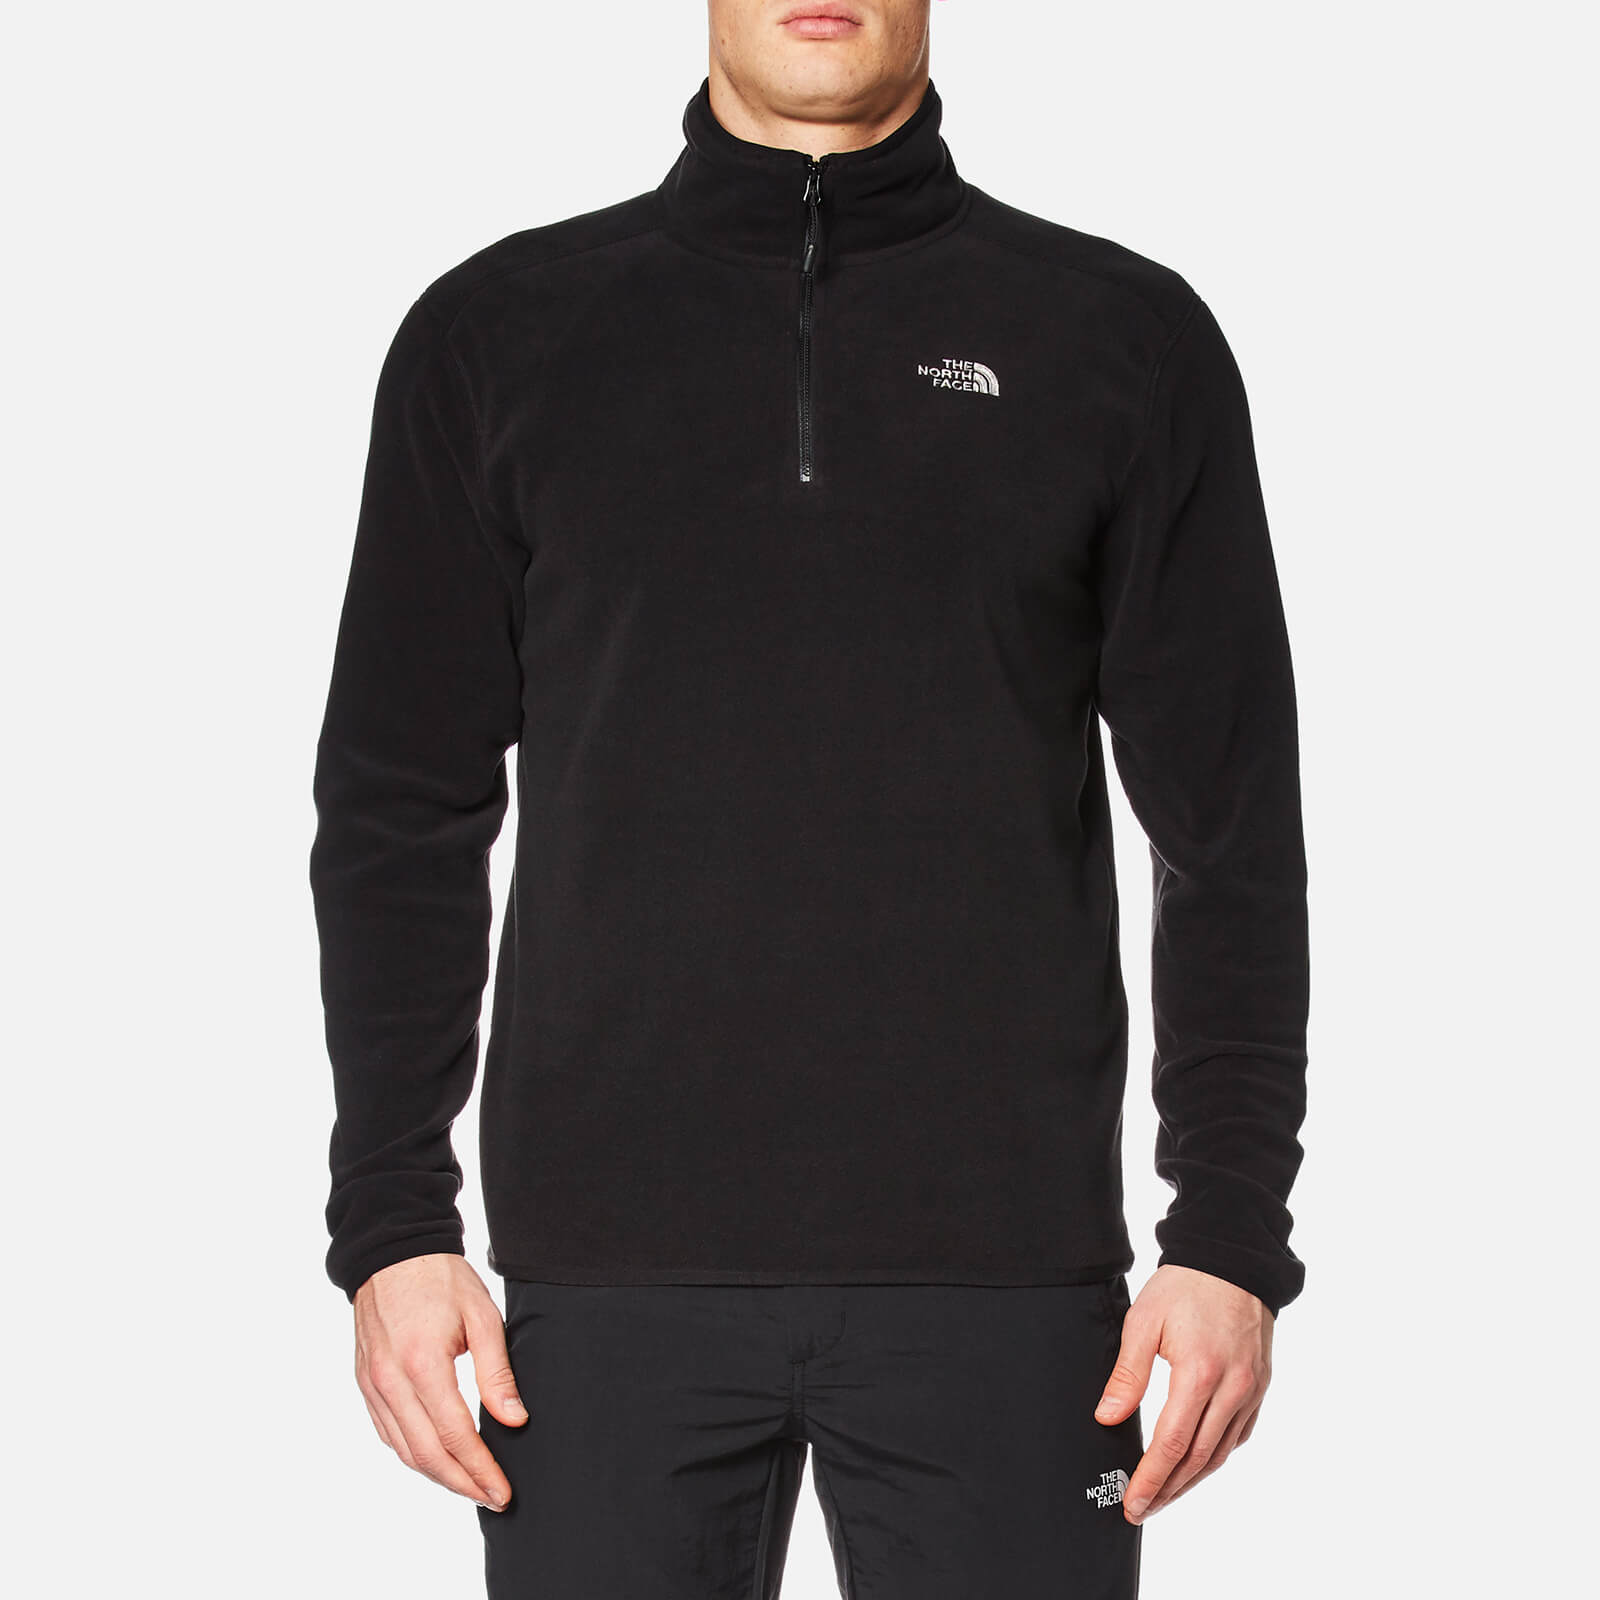 04509faec2b3 The North Face Men s 100 Glacier 1 4 Zip Fleece - TNF Black Clothing ...